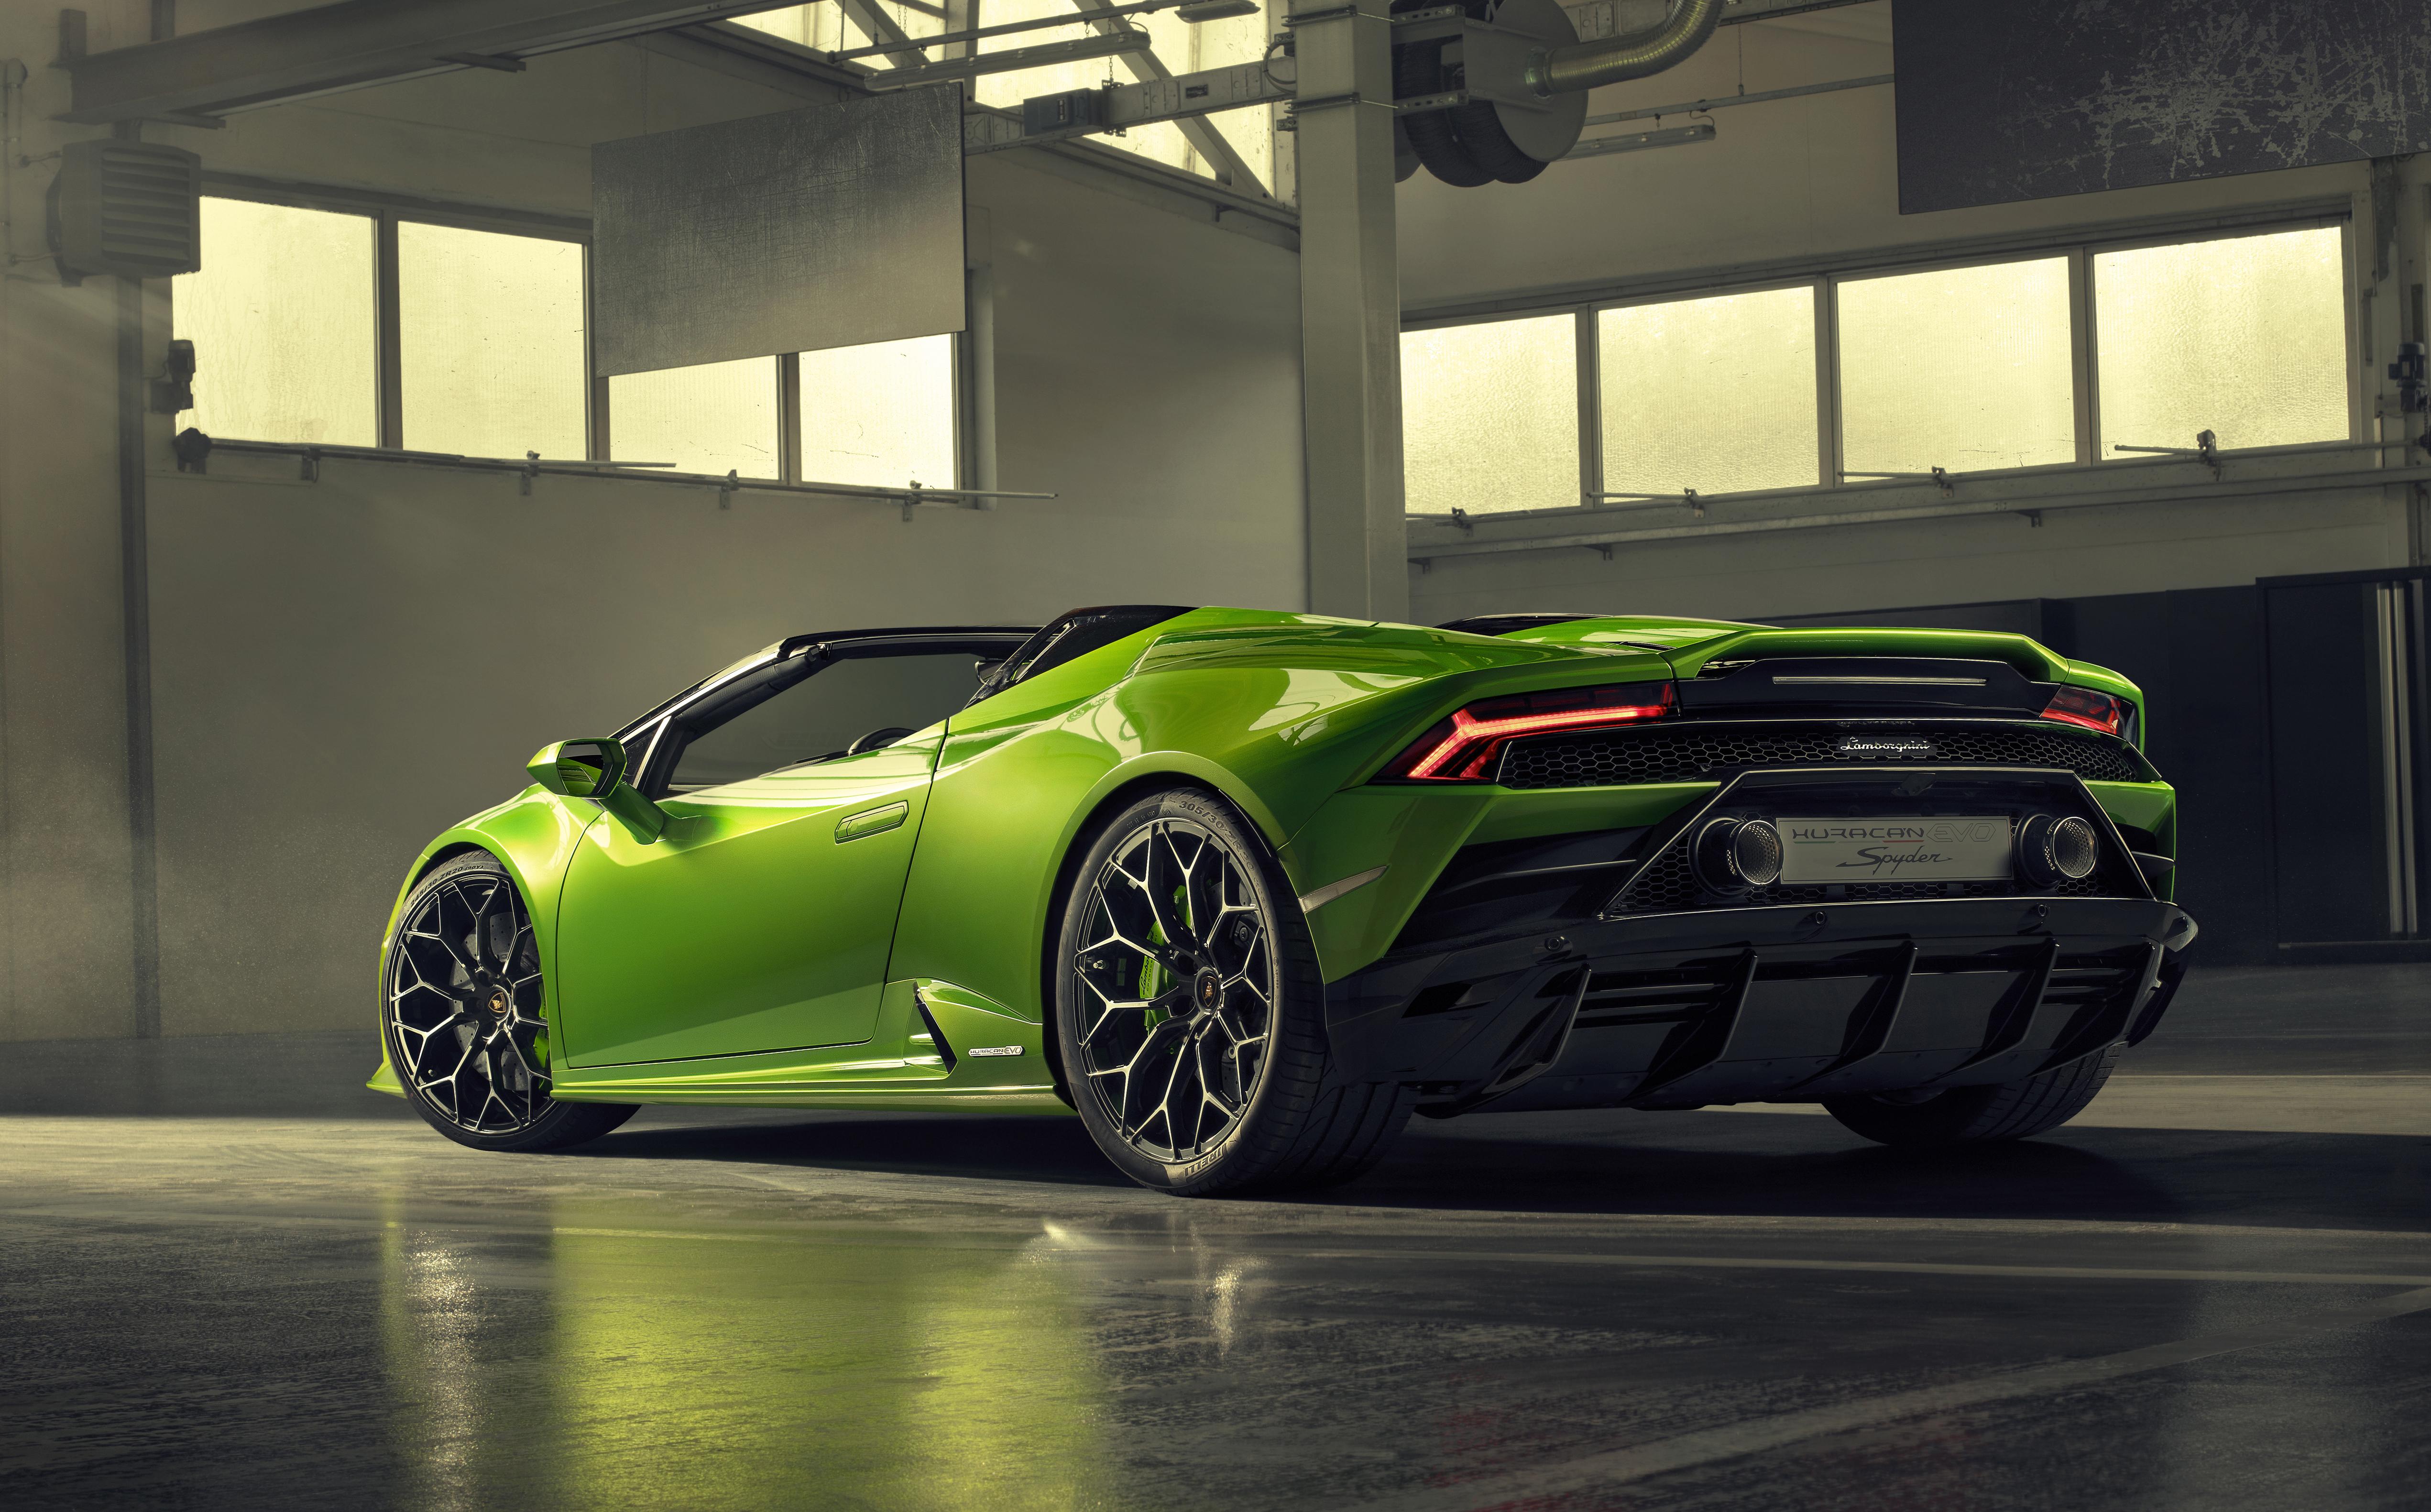 2019 Lamborghini Huracan Evo Spyder Rear View Hd Cars 4k